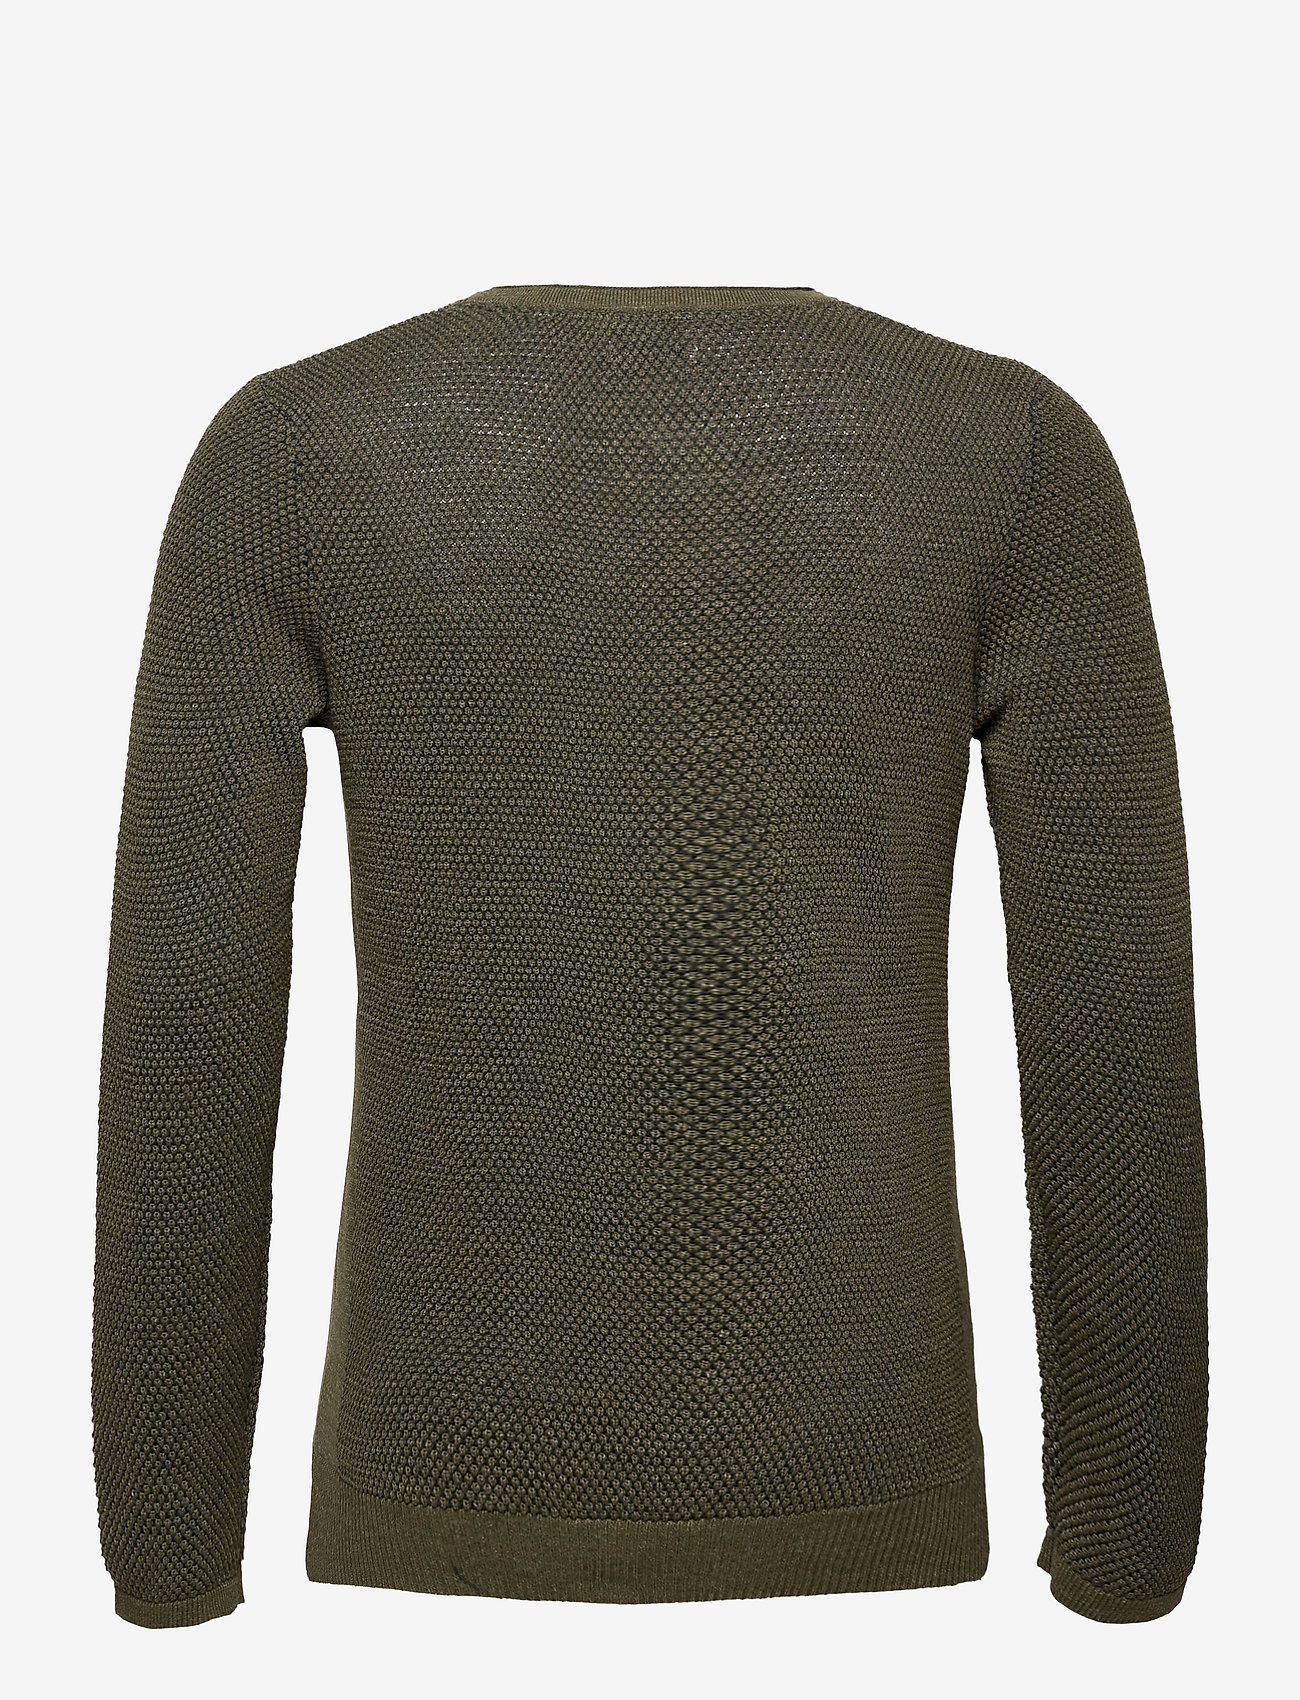 Tom Tailor sweater mini - Sweatshirts OLIVE NAVY PLATED - Menn Klær